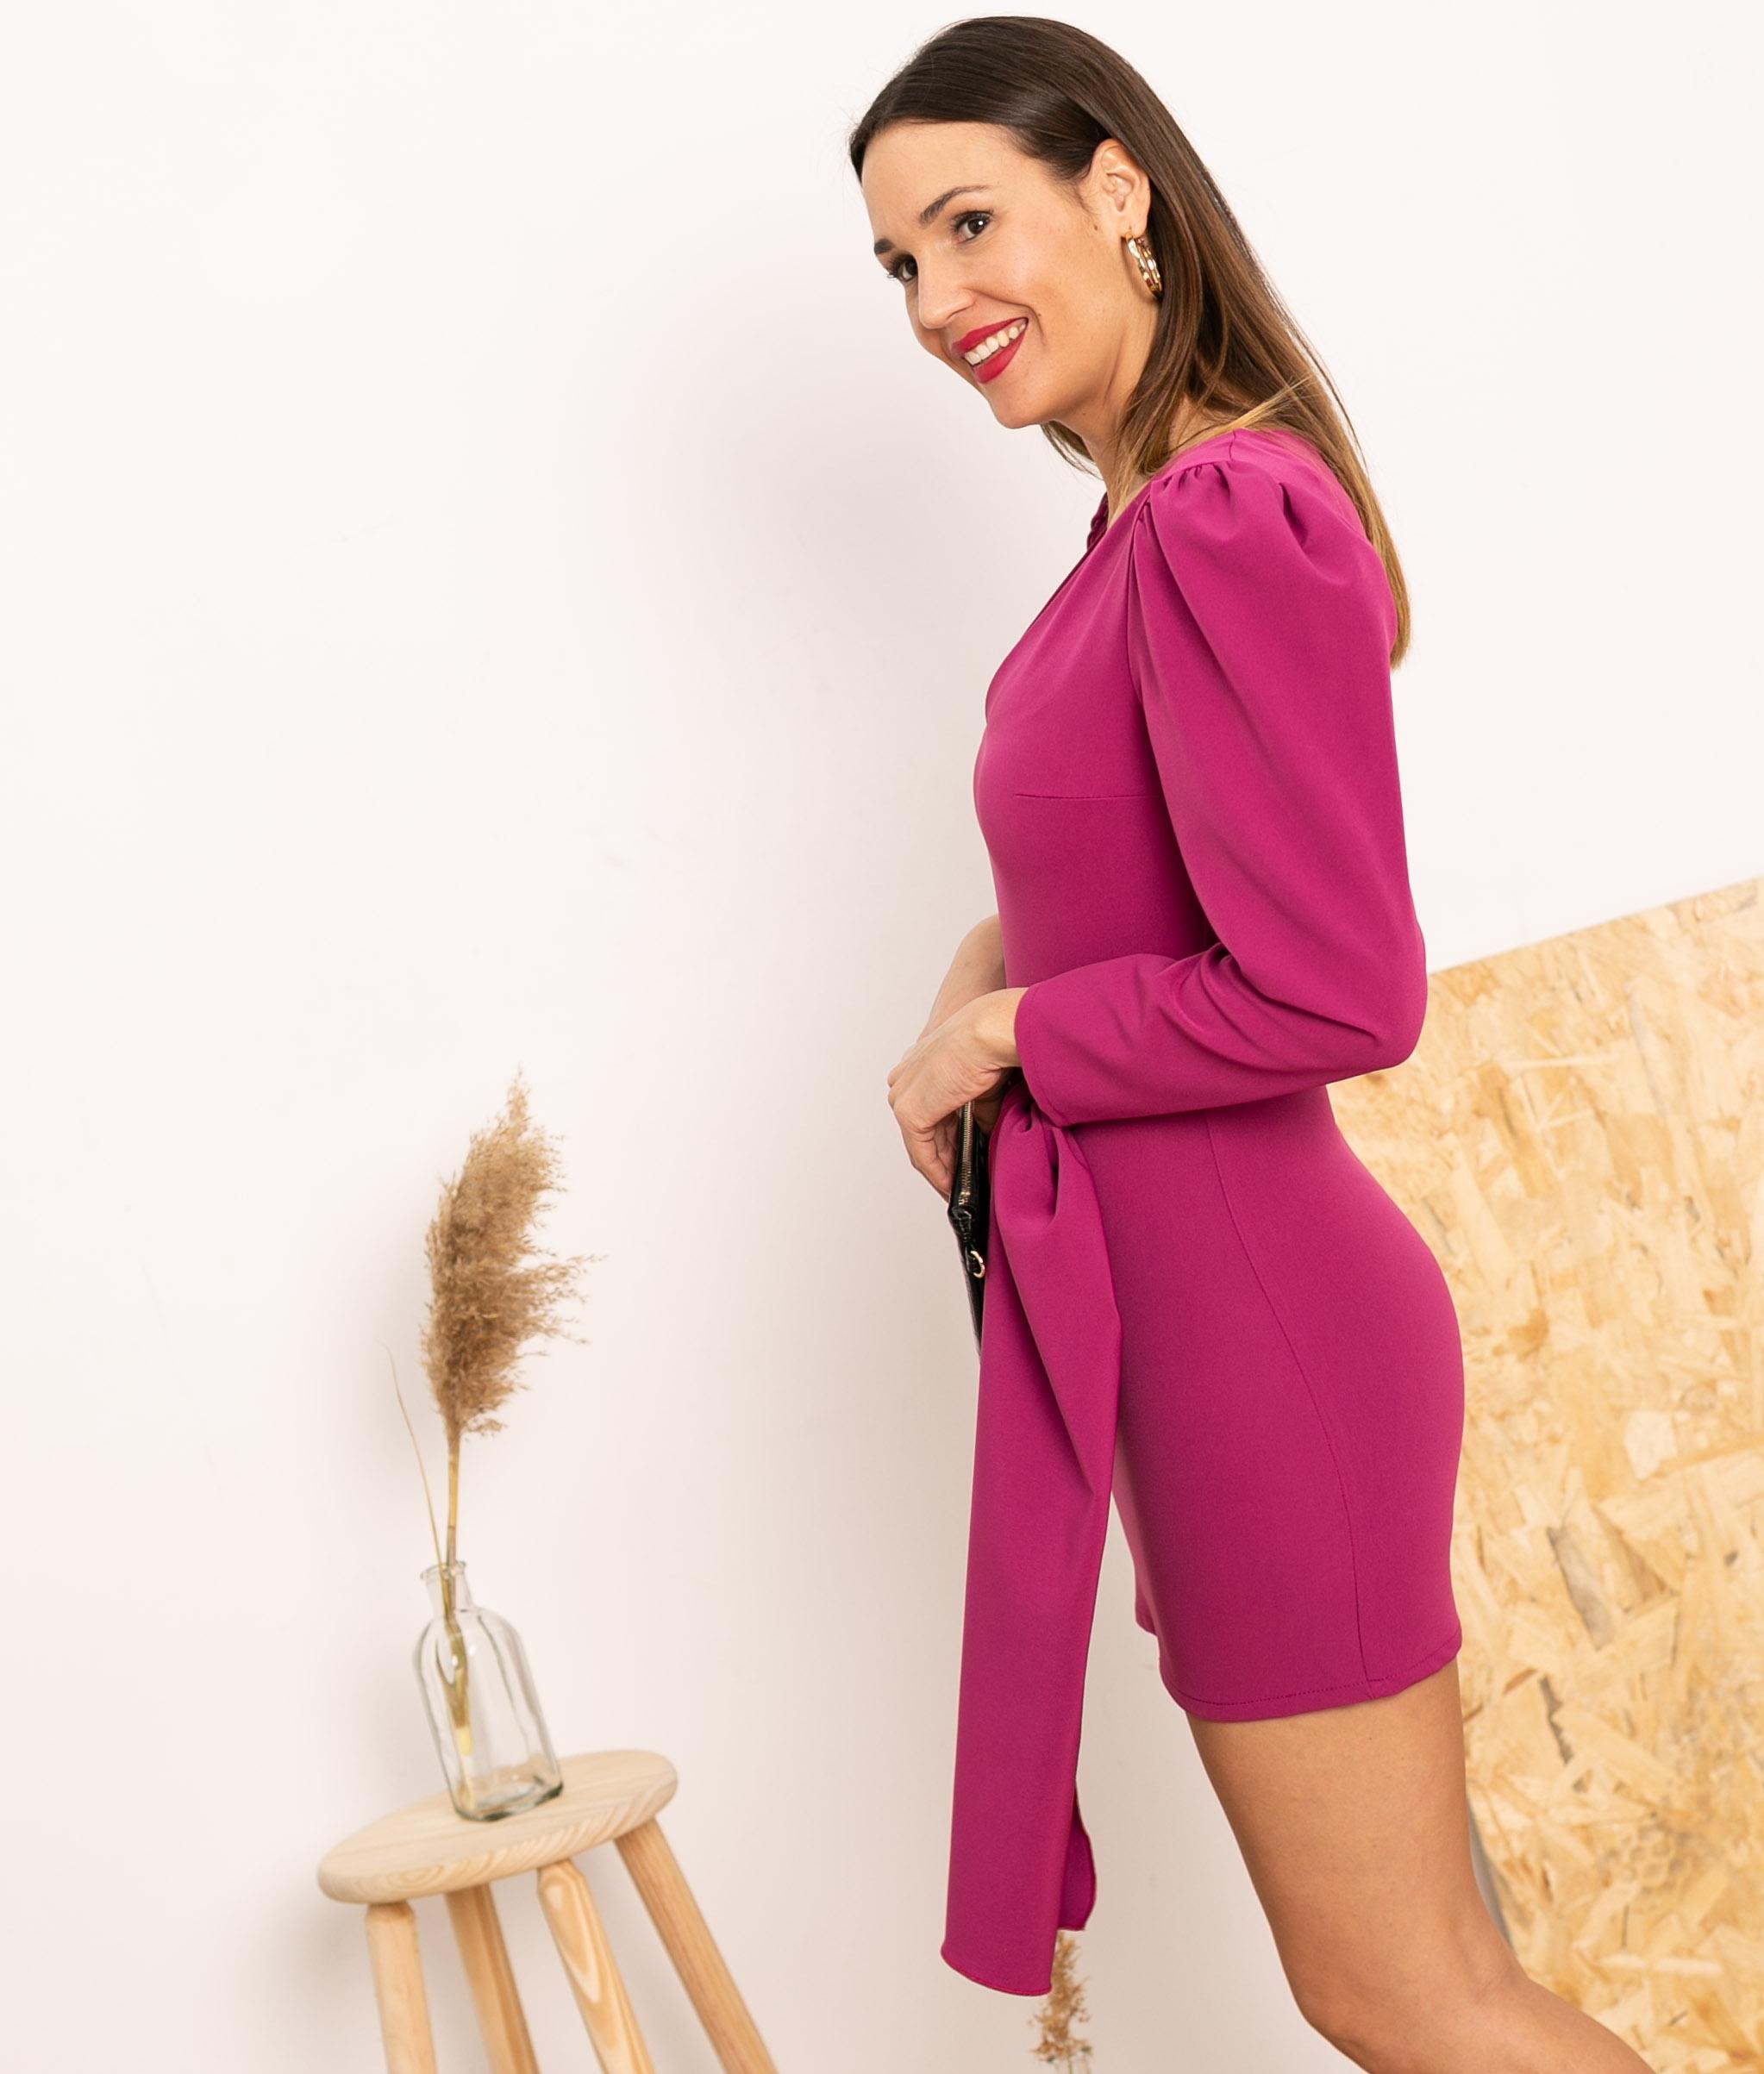 Vestido Cortes - Bougainvillier